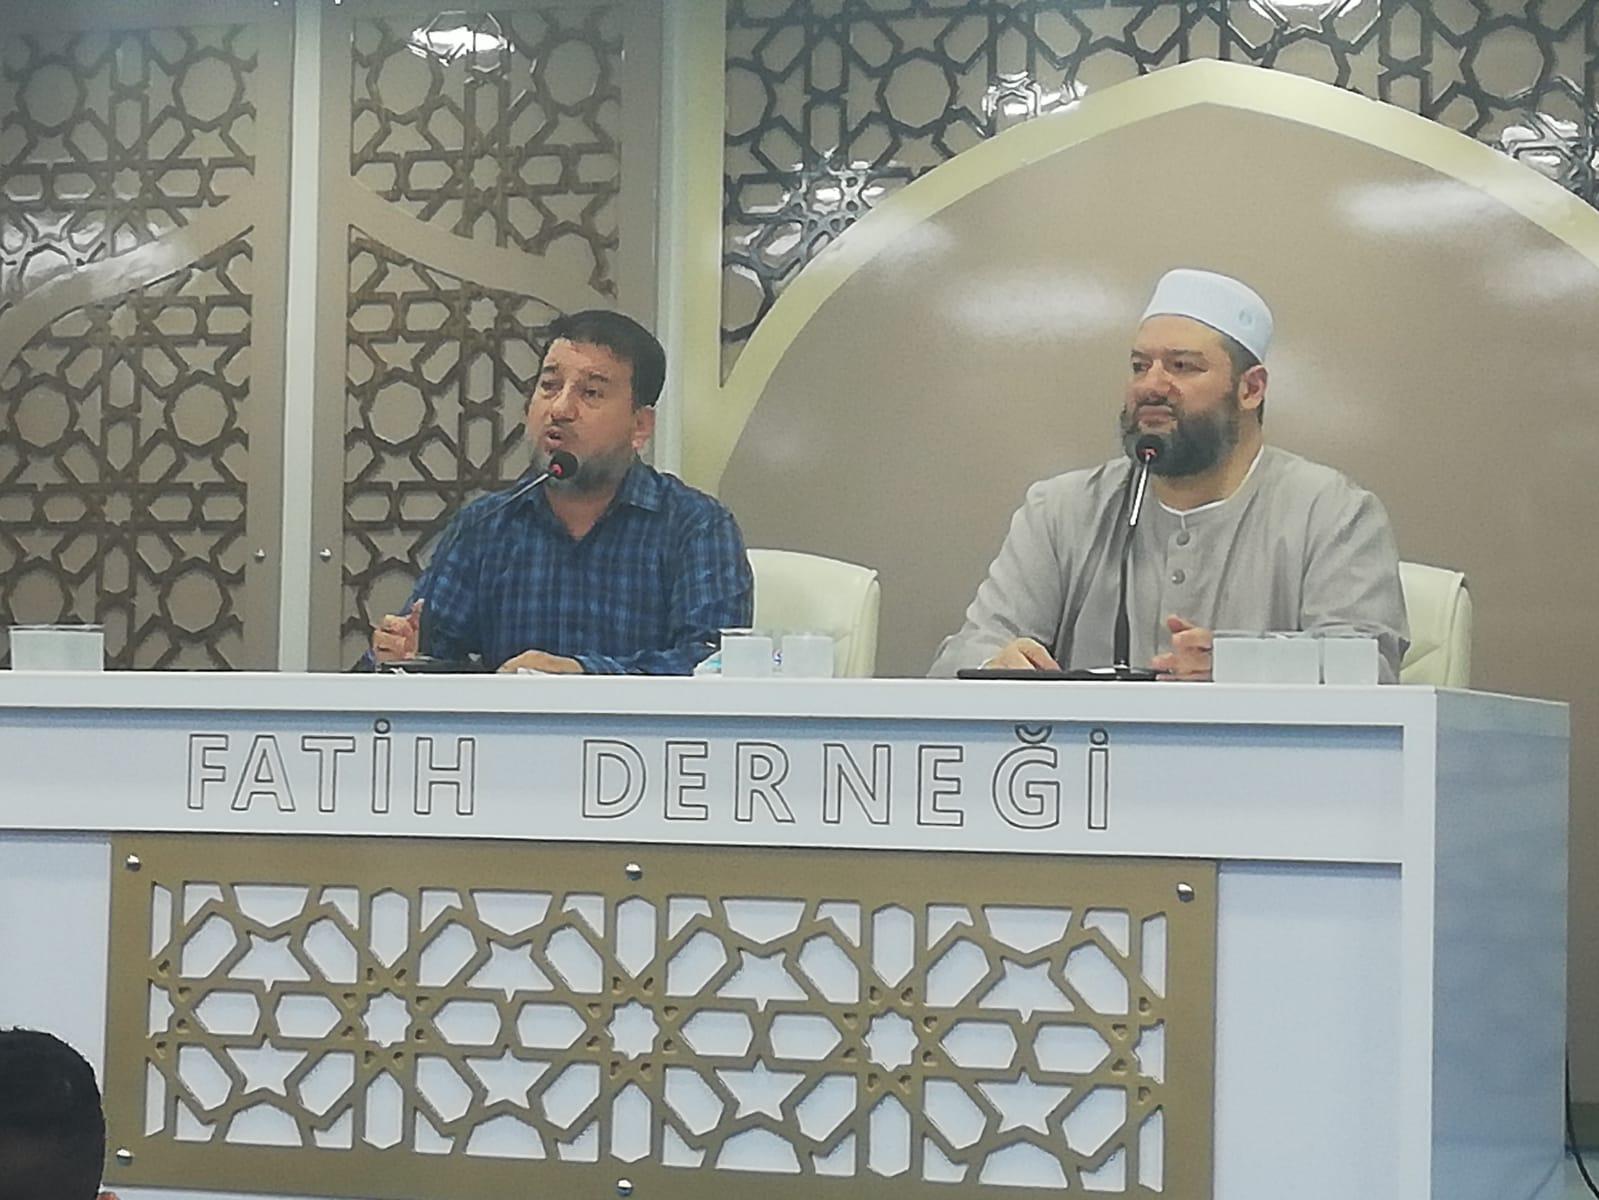 03 Lecture in Adana - Turkey 24 September 2021